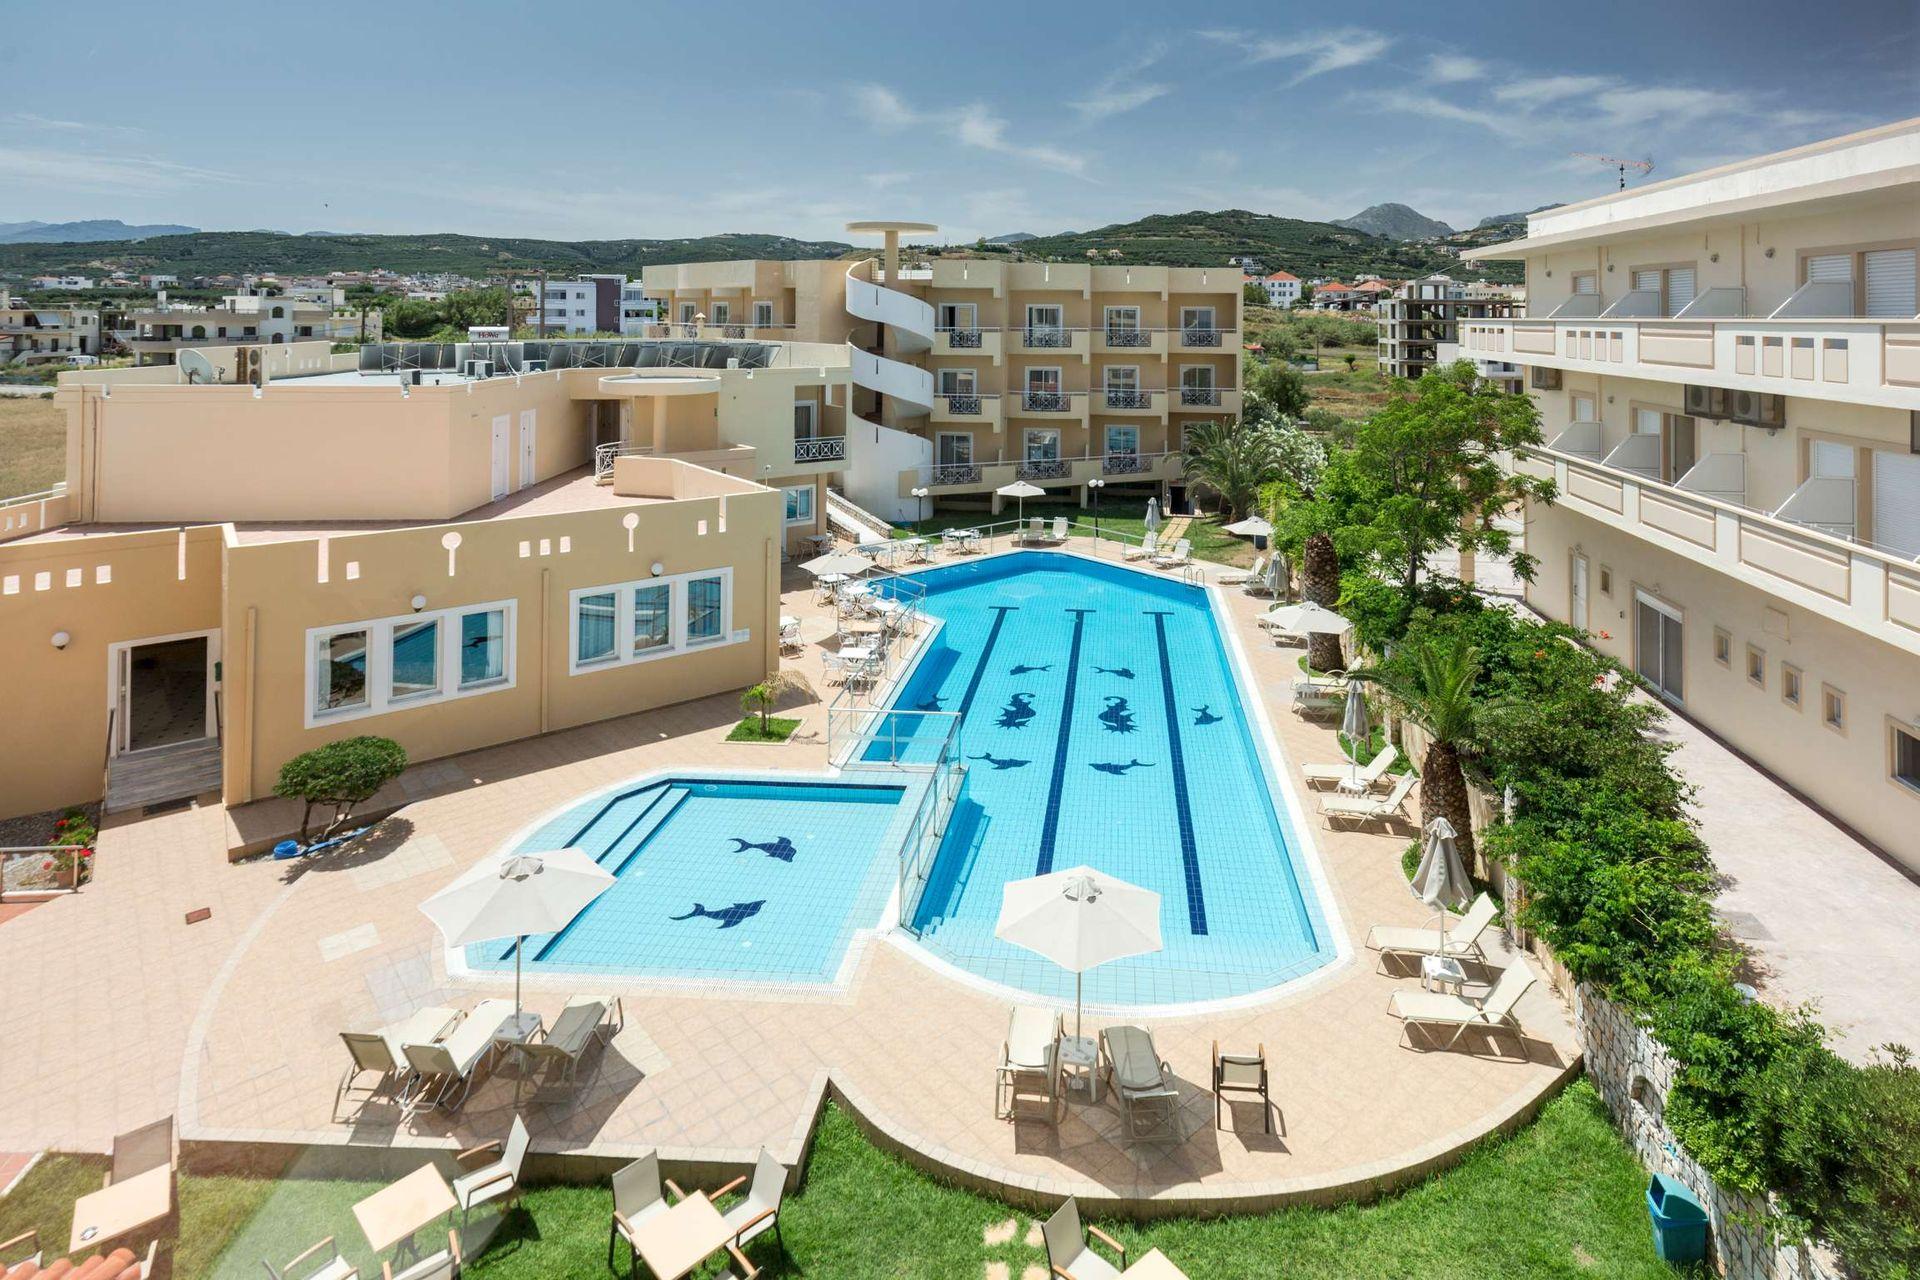 Sunny Bay Hotel- Xανιά, Κρήτη ✦ 2 Ημέρες (1 Διανυκτέρευση) ✦ 2 άτομα + 1 παιδί έως 11 ετών ✦ Χωρίς Πρωινό ✦ 11/09/2020 έως 30/09/2020 ✦ Free WiFi